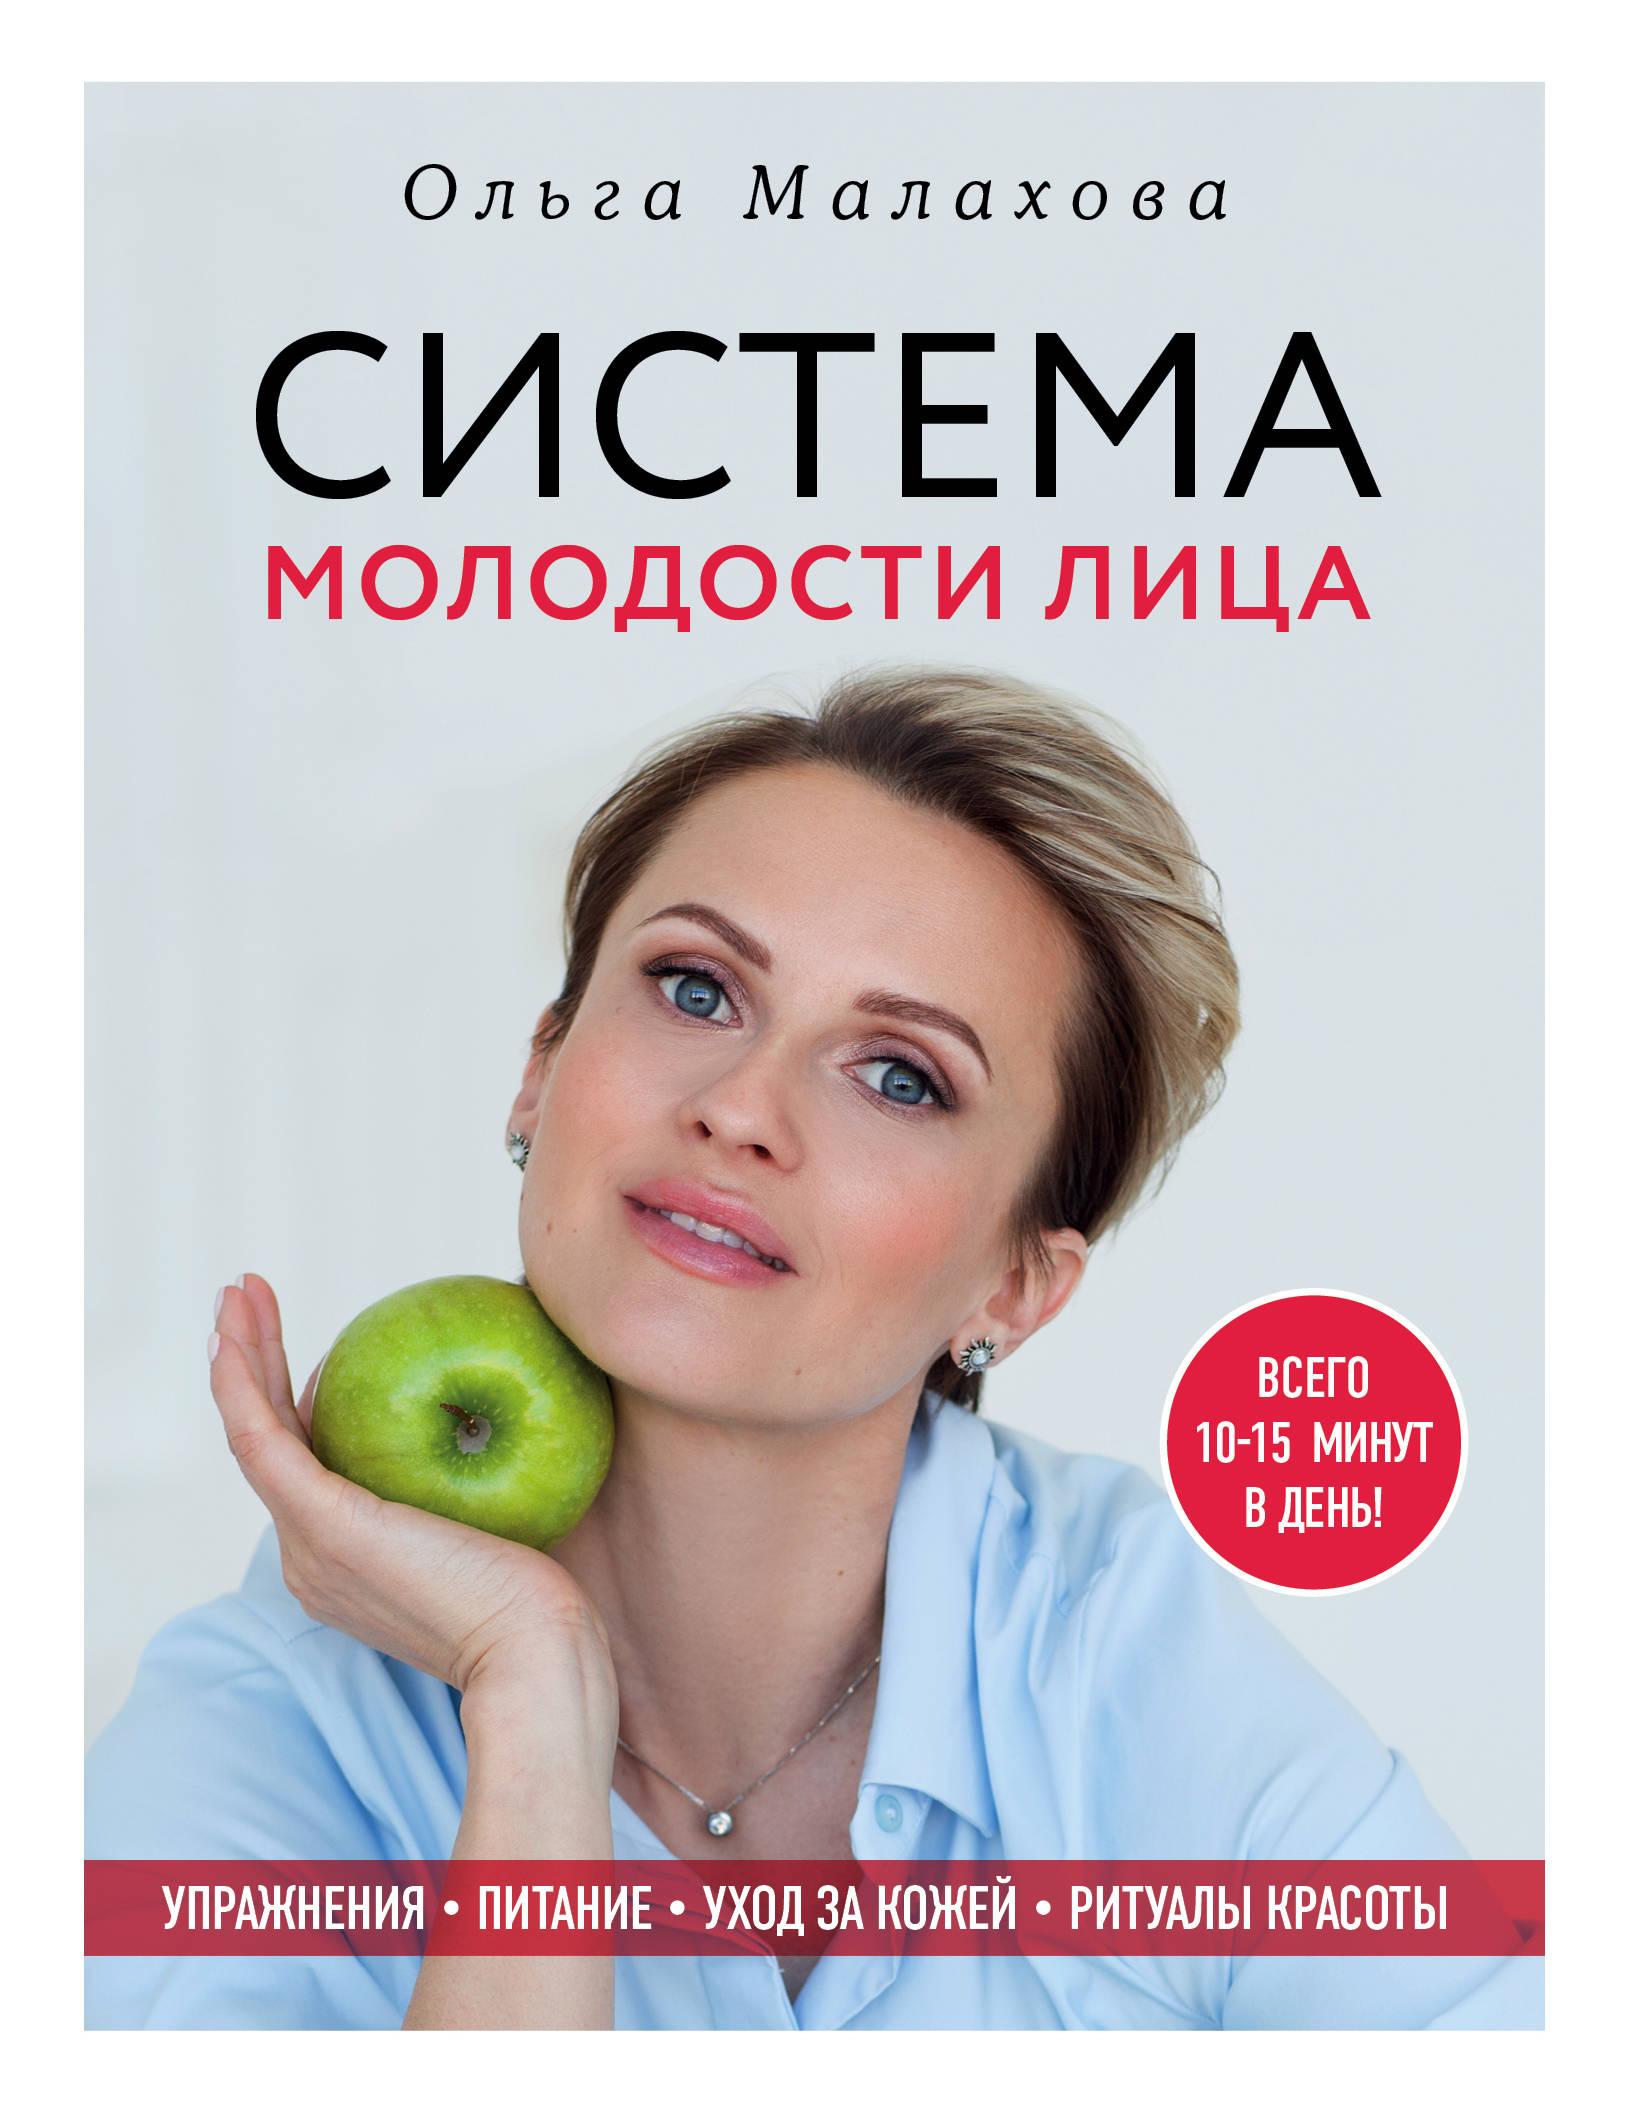 Малахова Ольга Валериевна Ольга Малахова. Система молодости лица